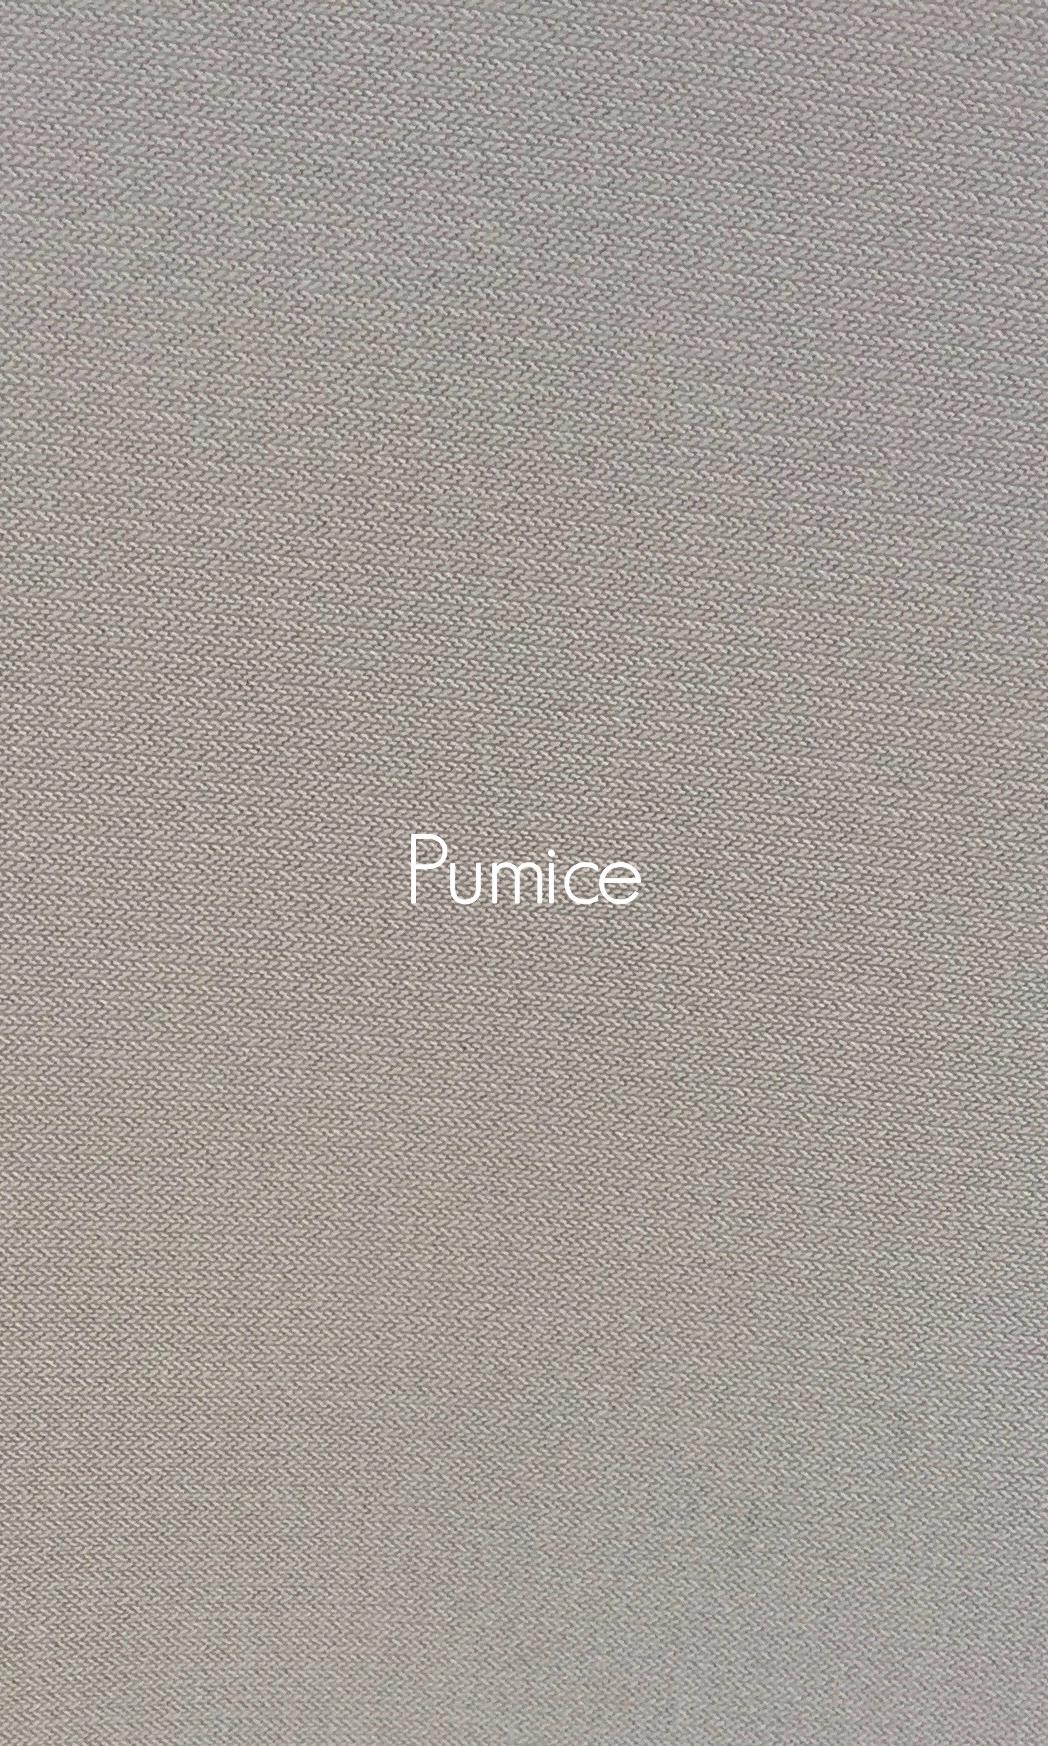 punice.jpg